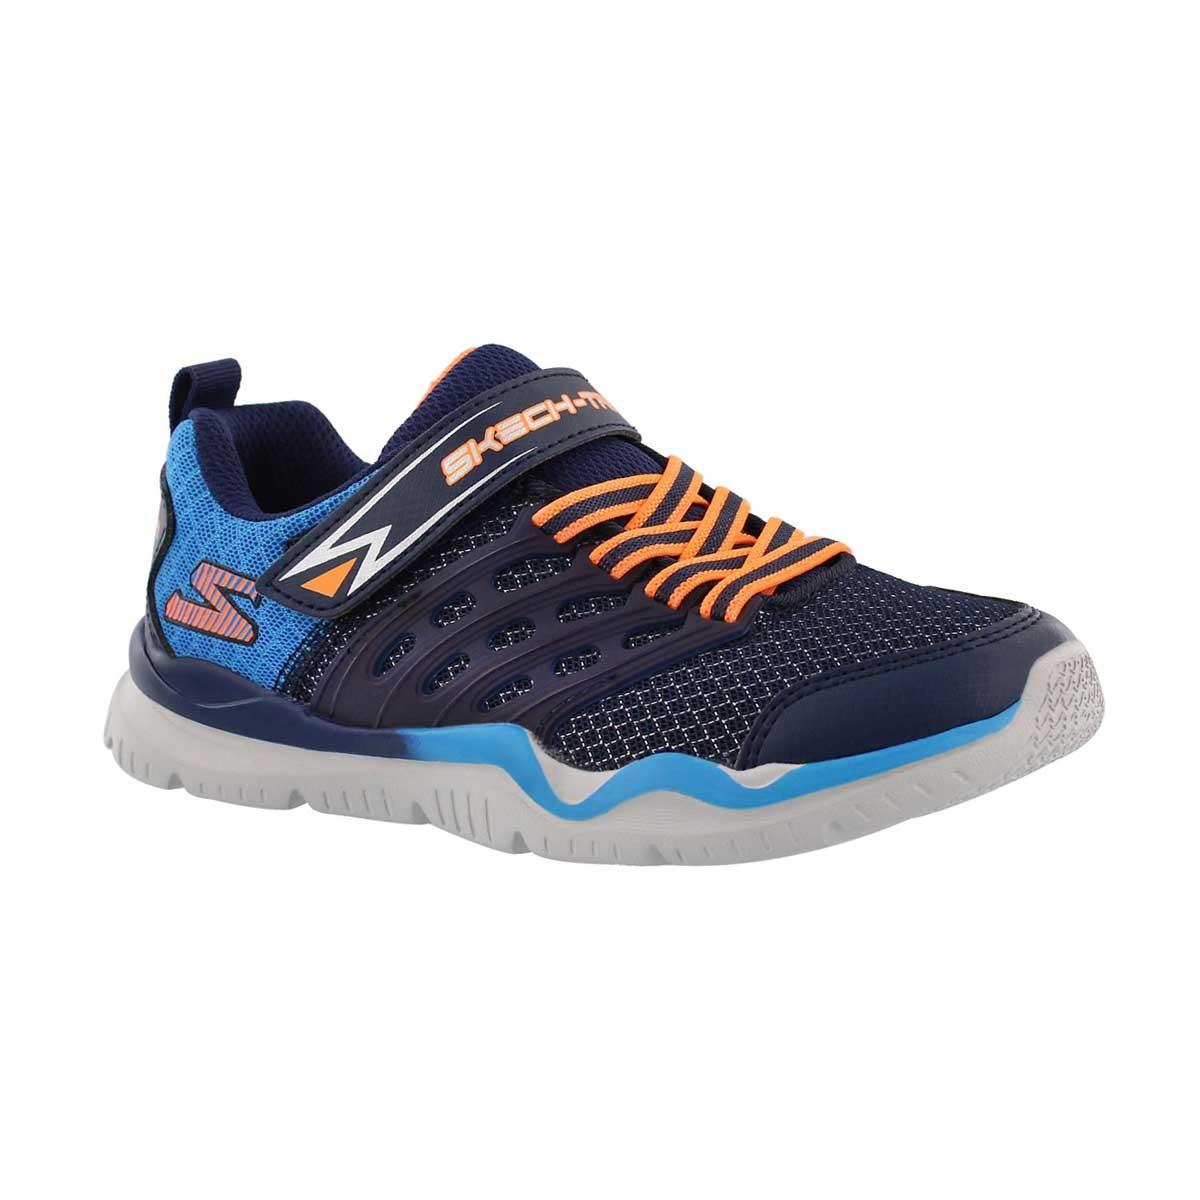 Boys' SKECH-TRAIN navy/blue slip on sneakers